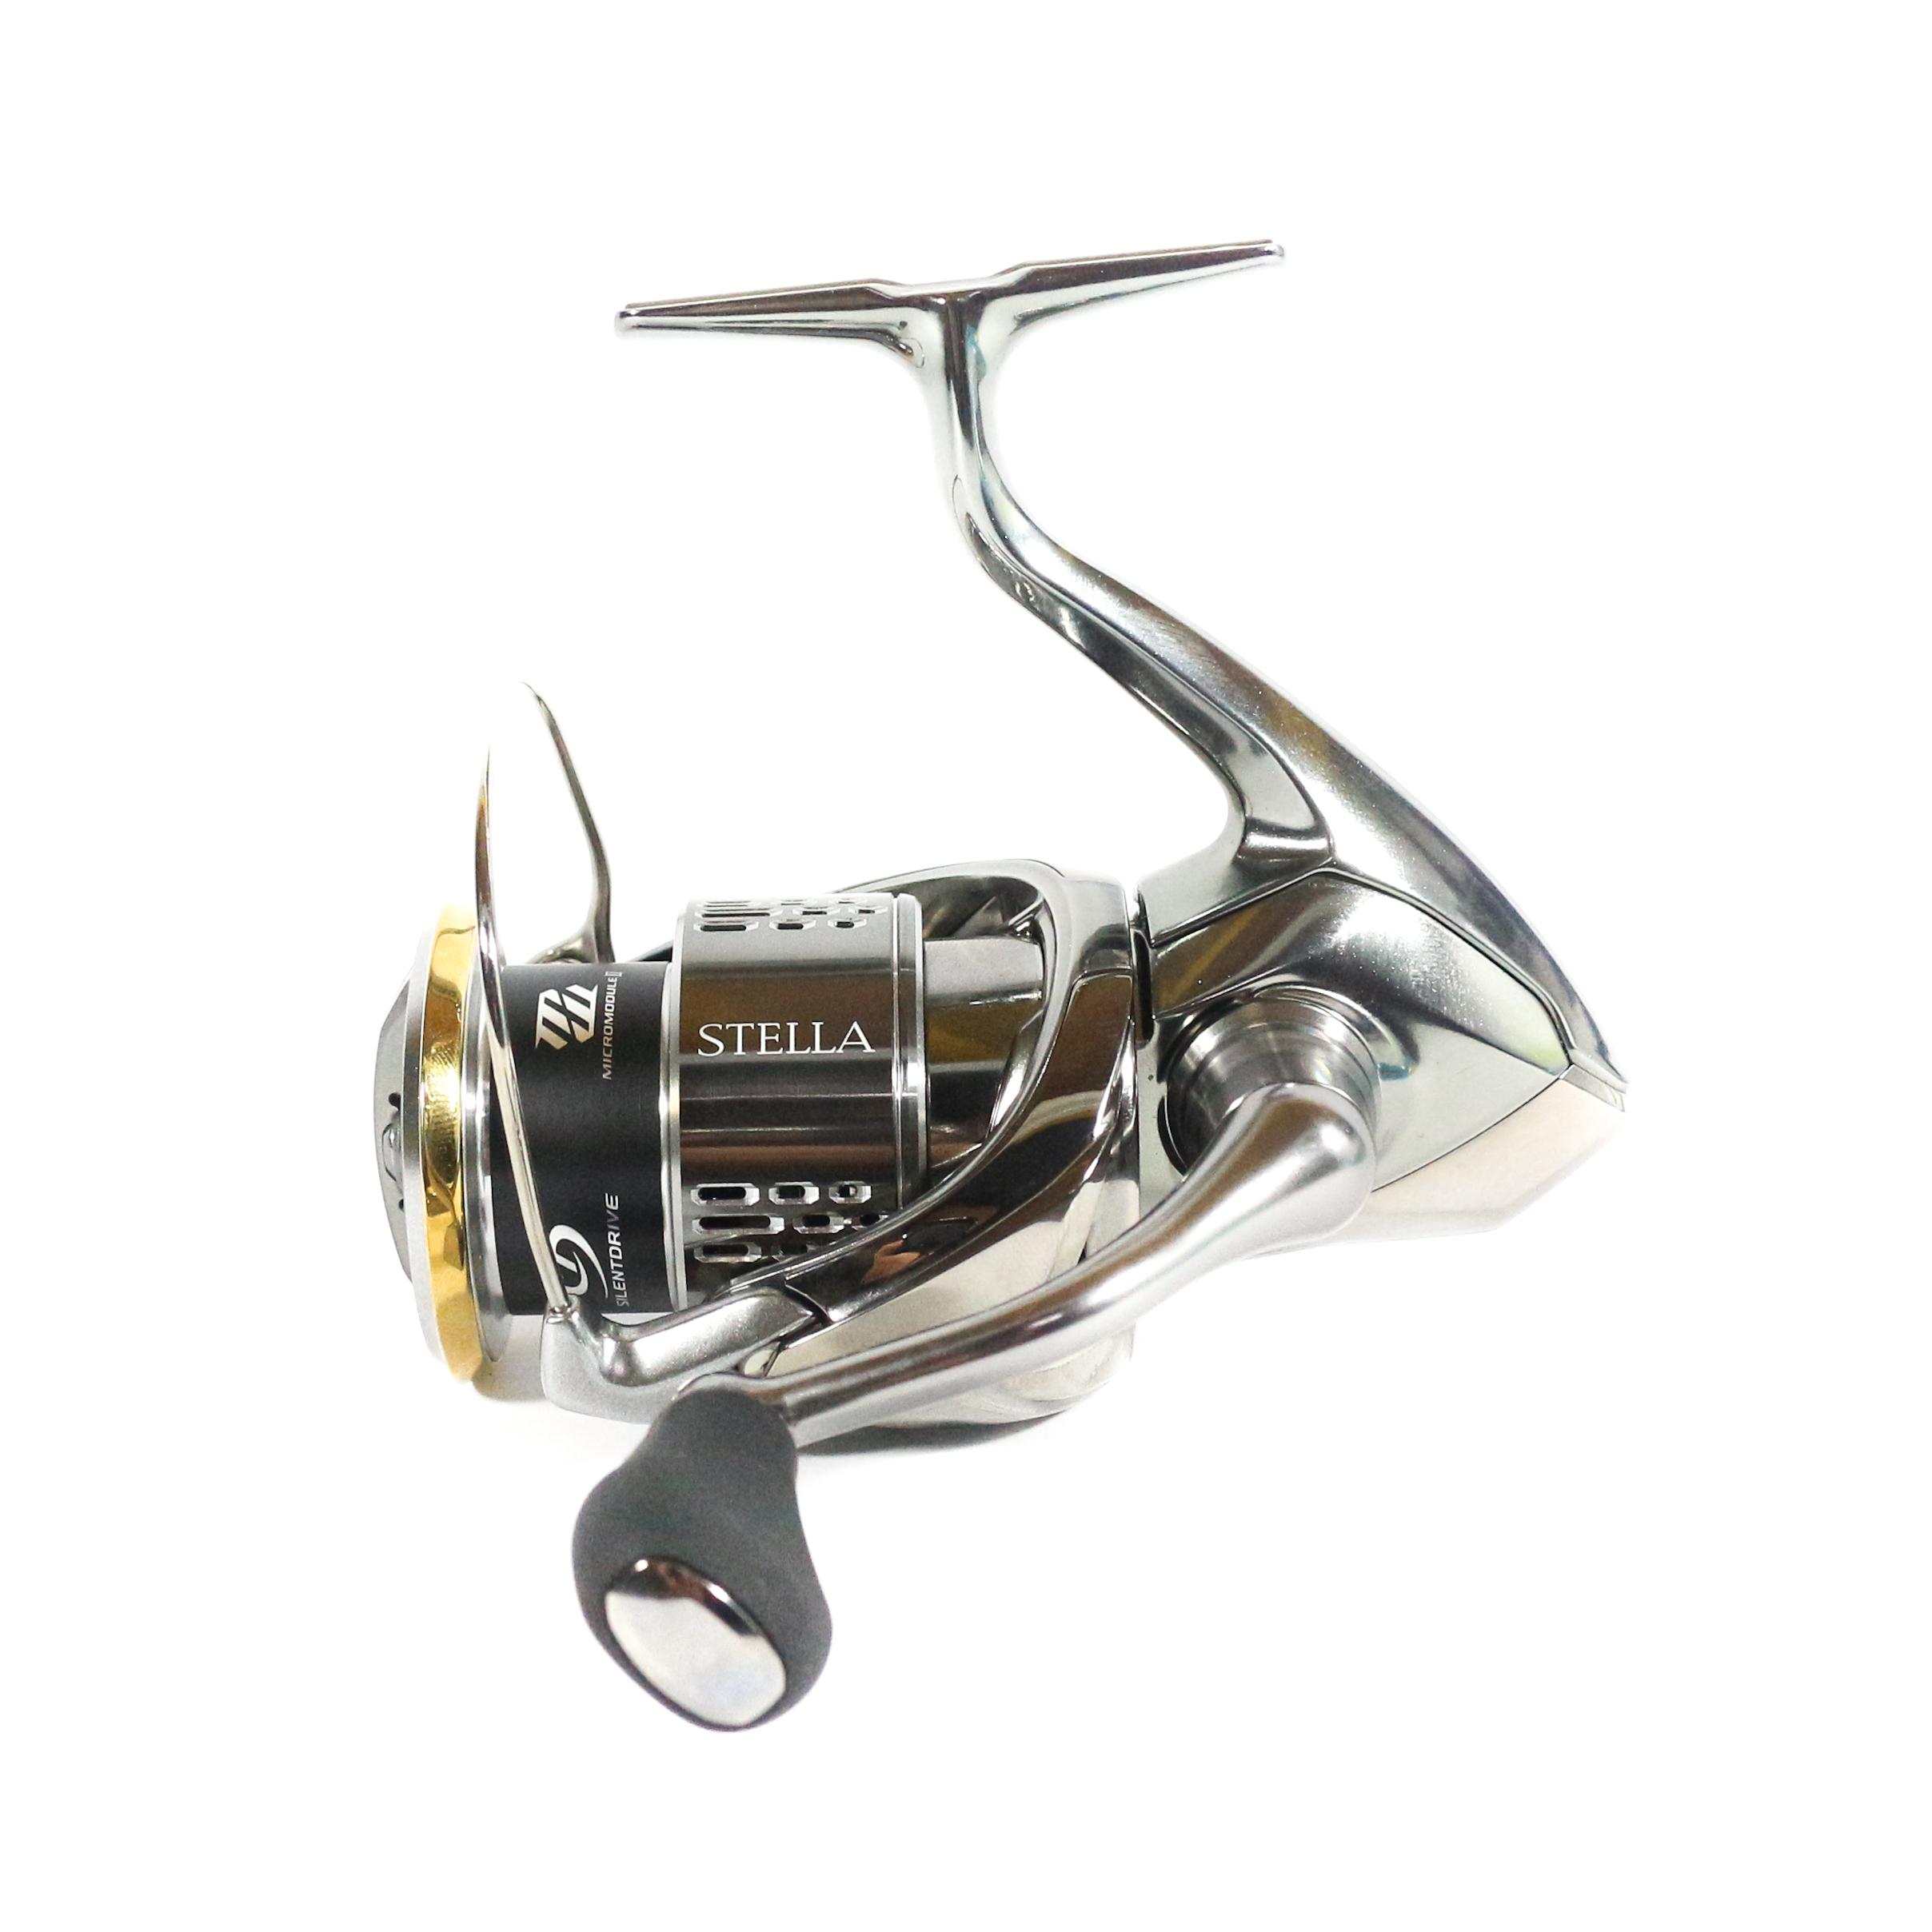 Shimano Reel Spinning Stella 2500 FJ (591203)